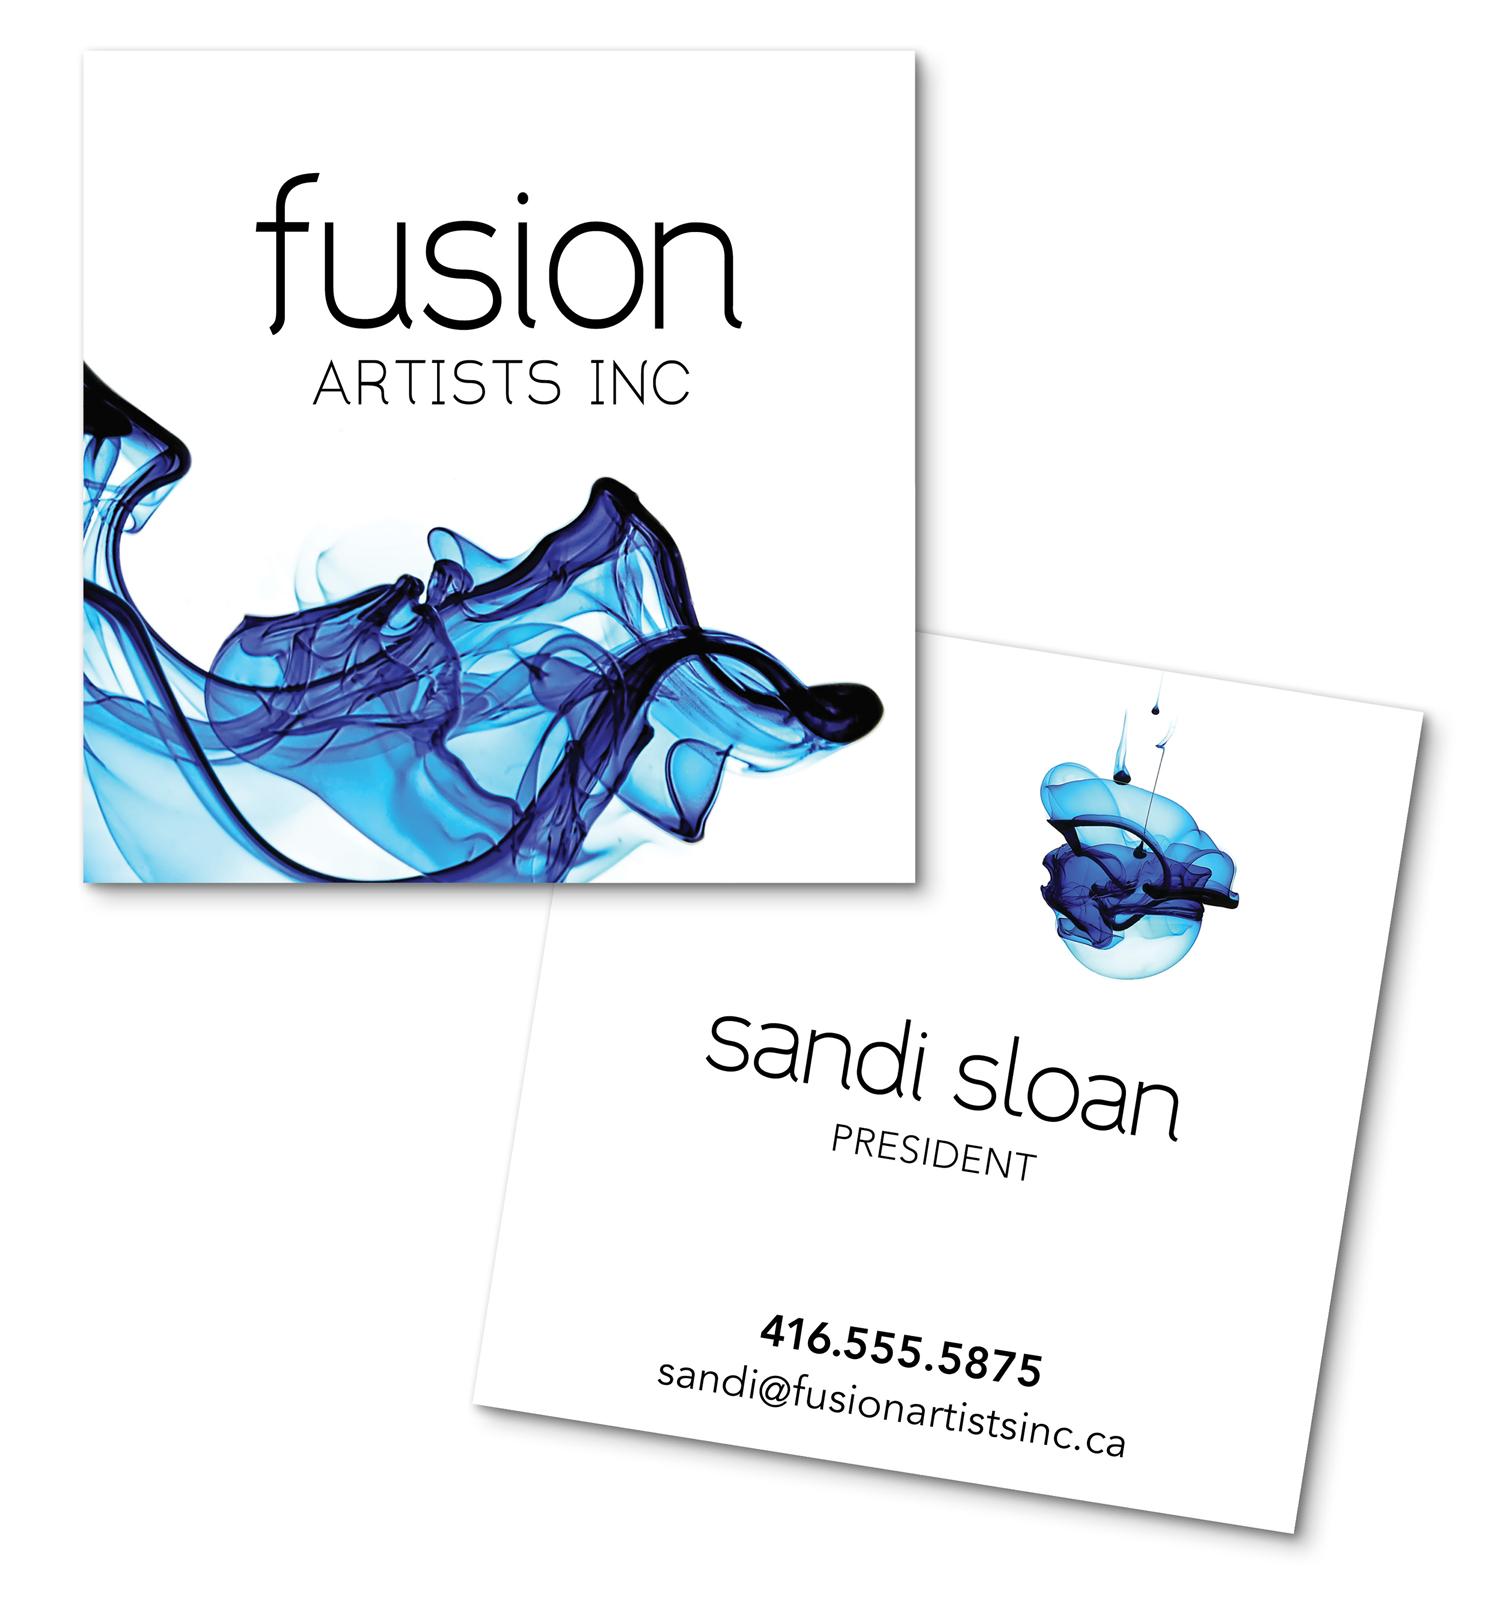 Brand identity design for Fusion Artists Inc by Bonnie Summerfeldt Design